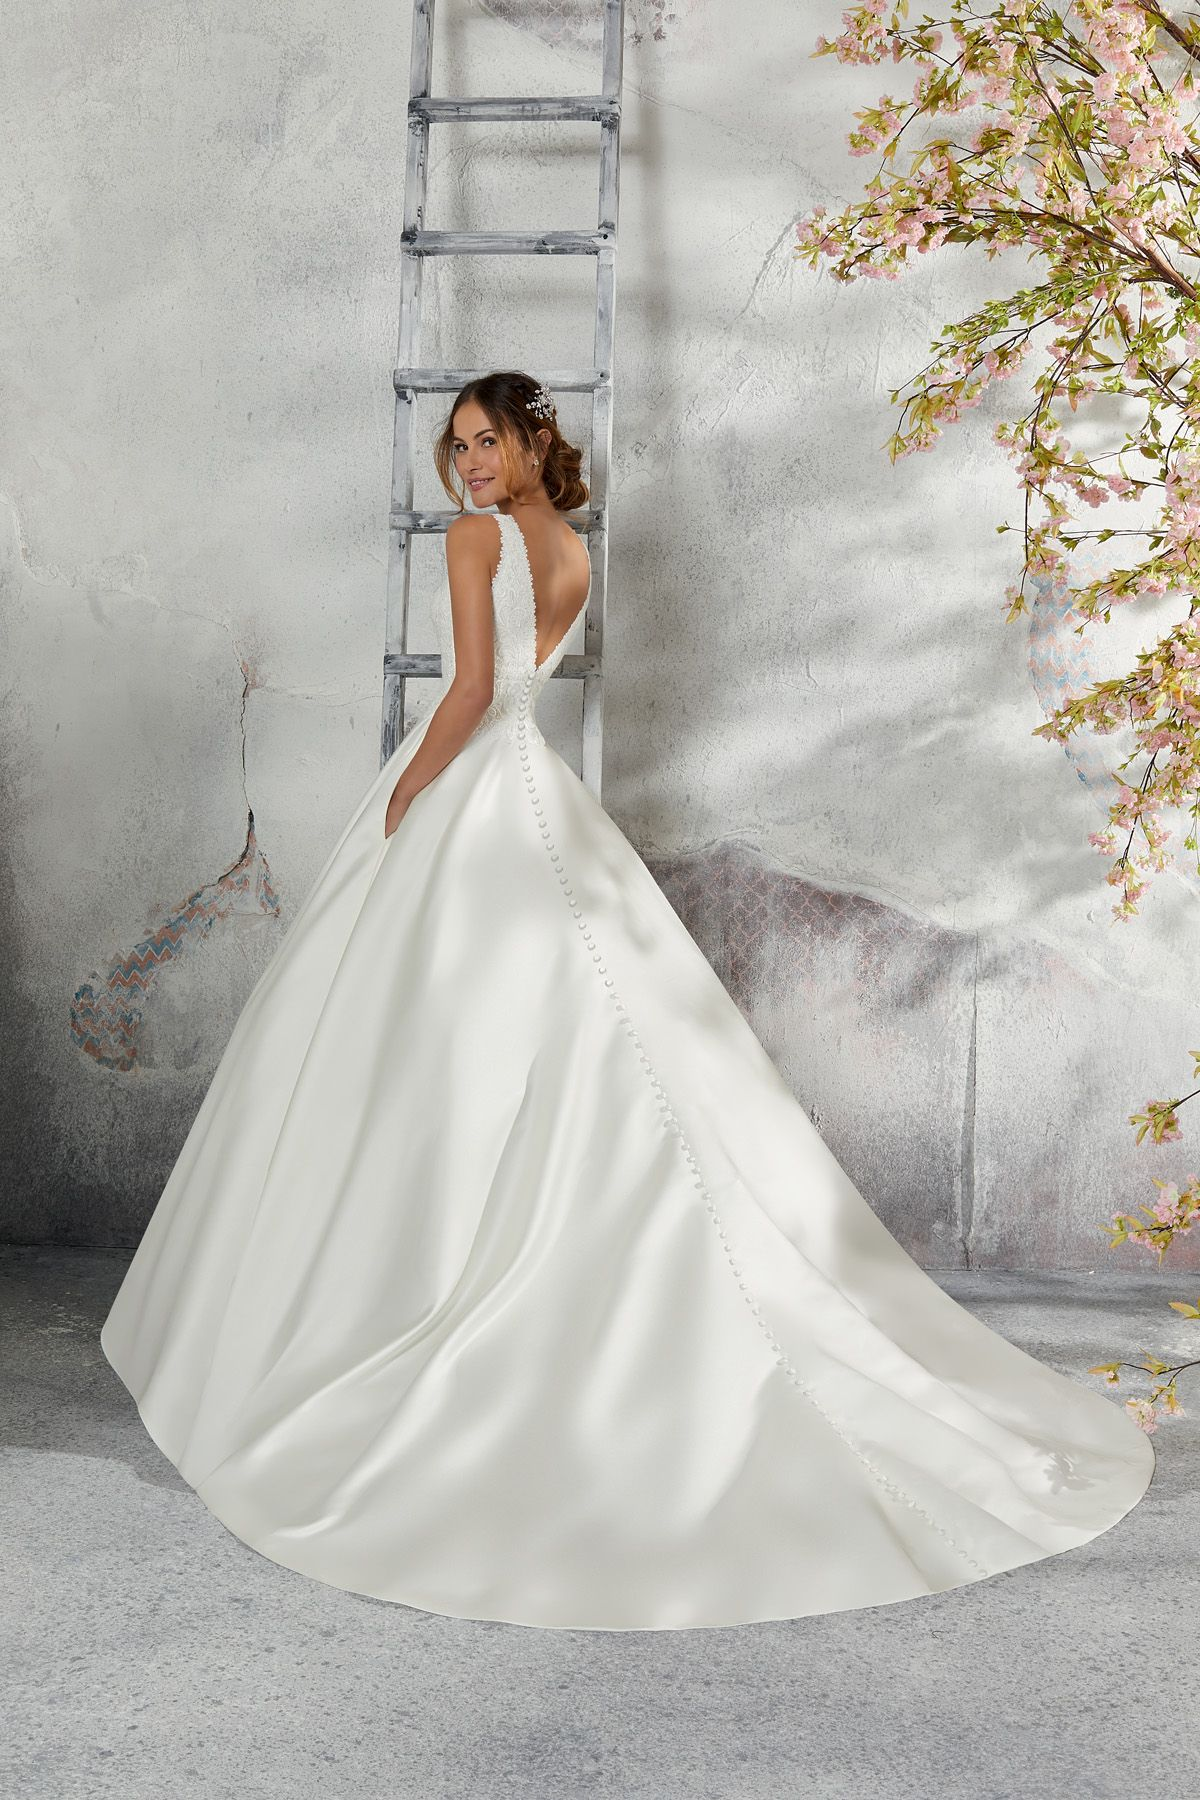 Lace wedding dress ivory january 2019 Mori Lee  Wedding Dresses in Sydney  Wedding Dresses  Pinterest